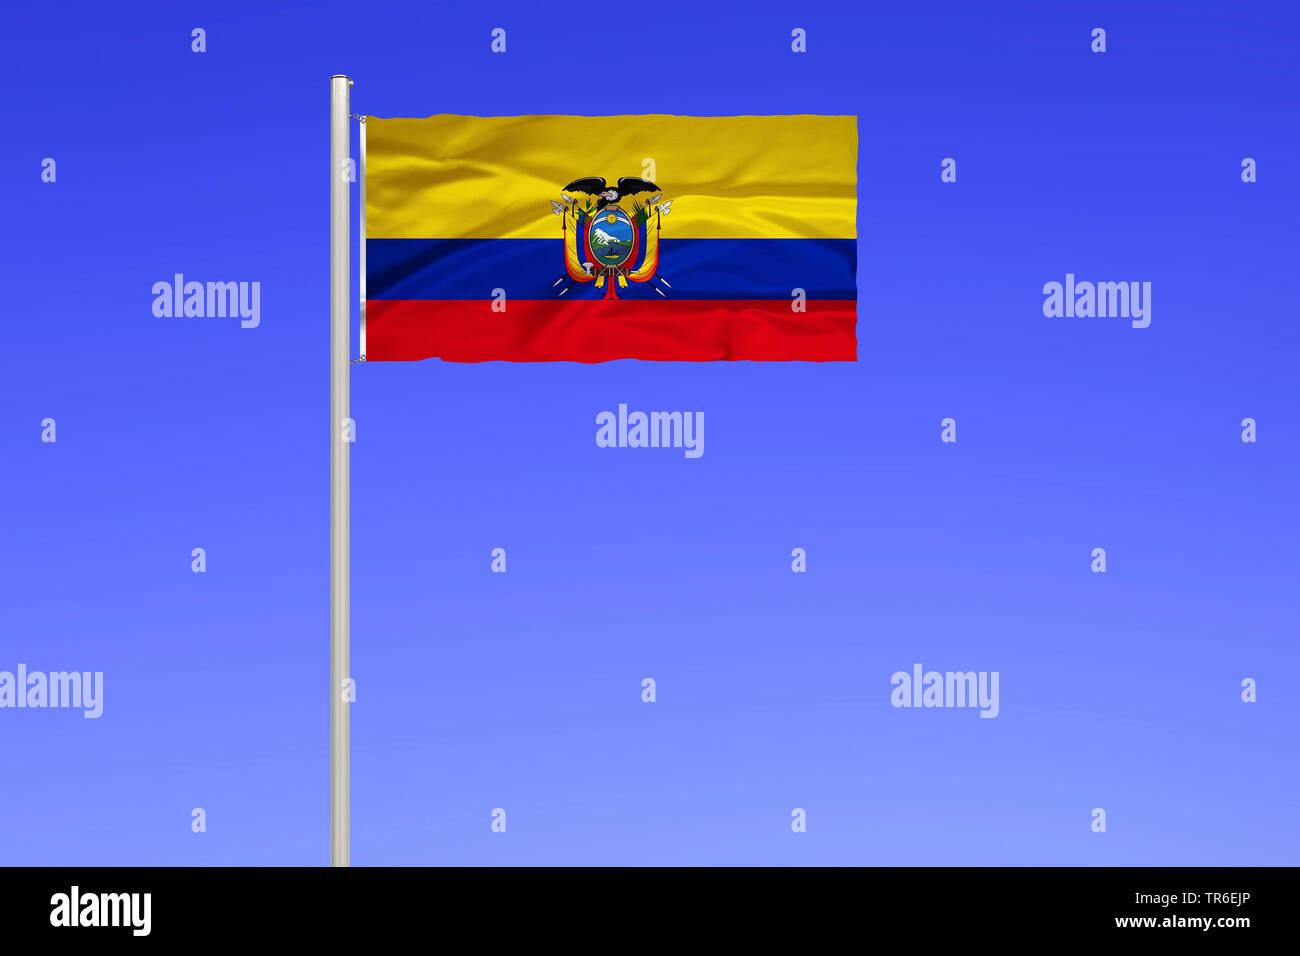 Flagge von Ecuador vor blauem Himmel, Ecuador | flag of Ecuador against blue sky, Ecuador | BLWS482139.jpg [ (c) blickwinkel/McPHOTO/K. Steinkamp Tel. - Stock Image